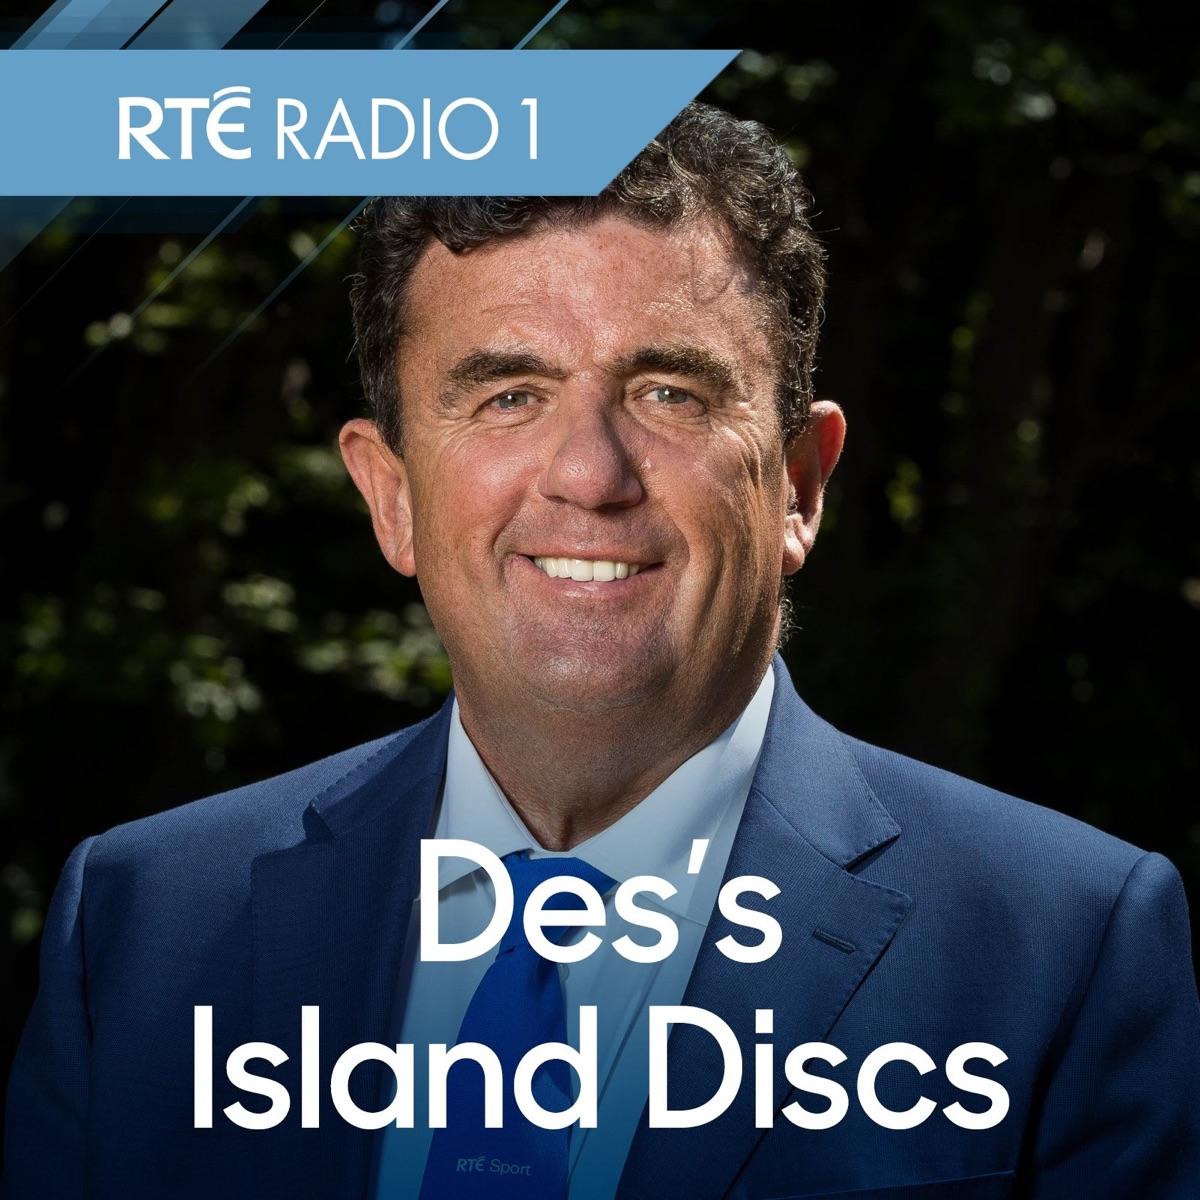 Des's Island Discs